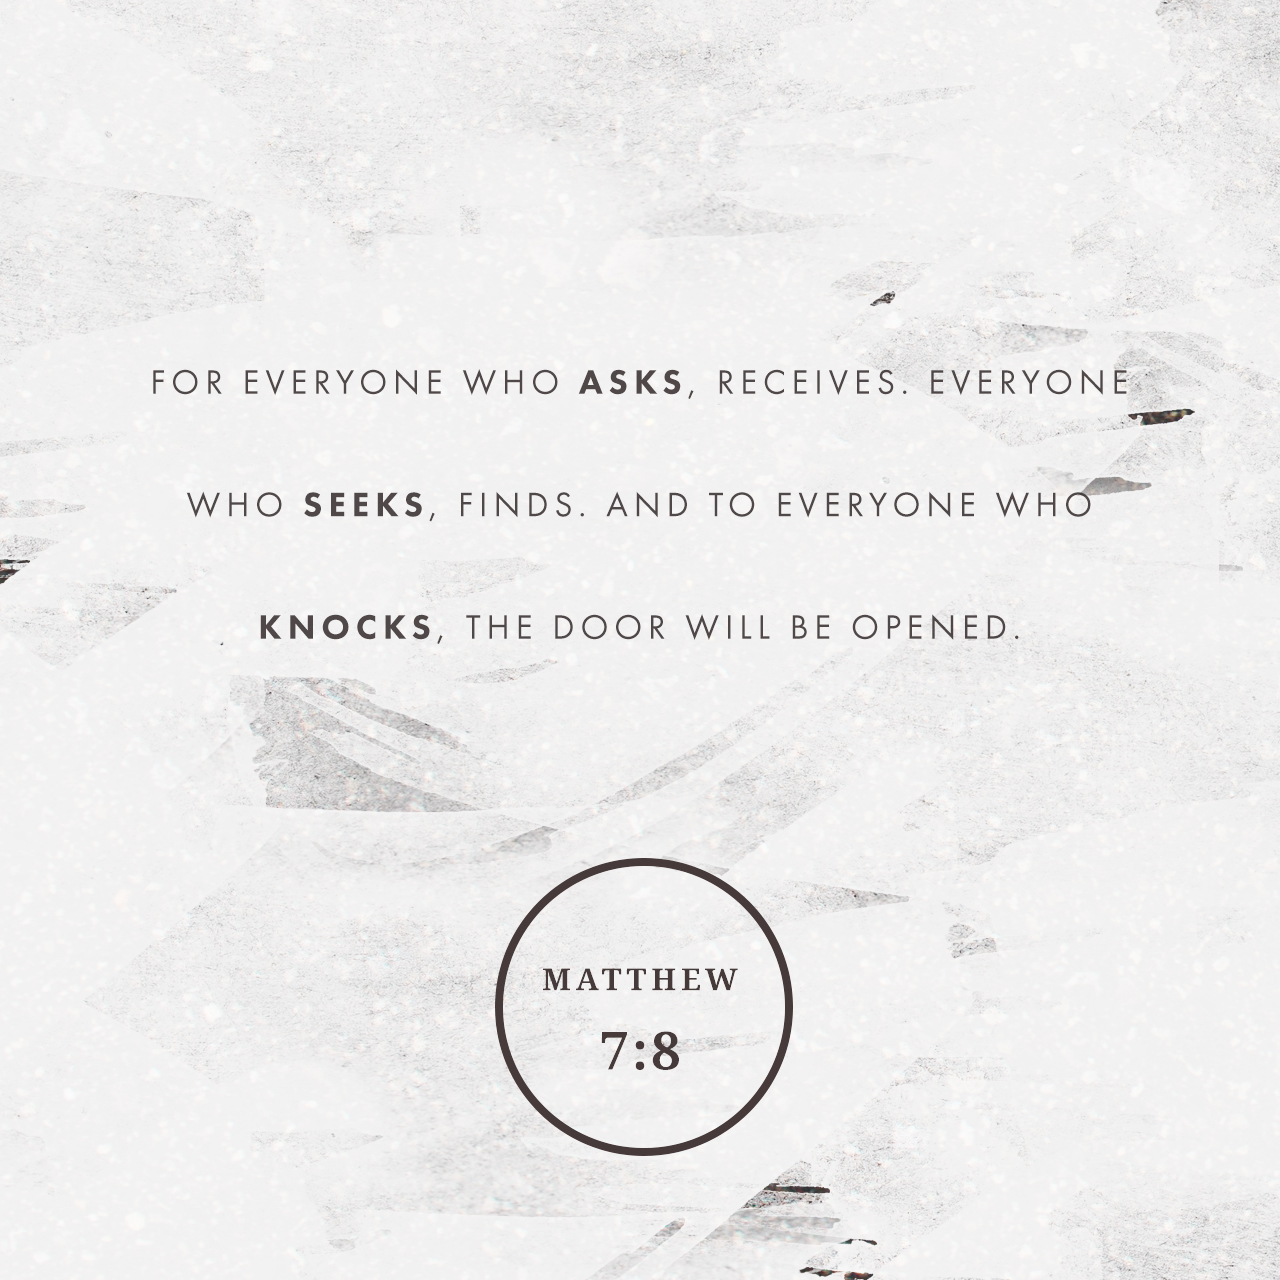 Matthew 7:8